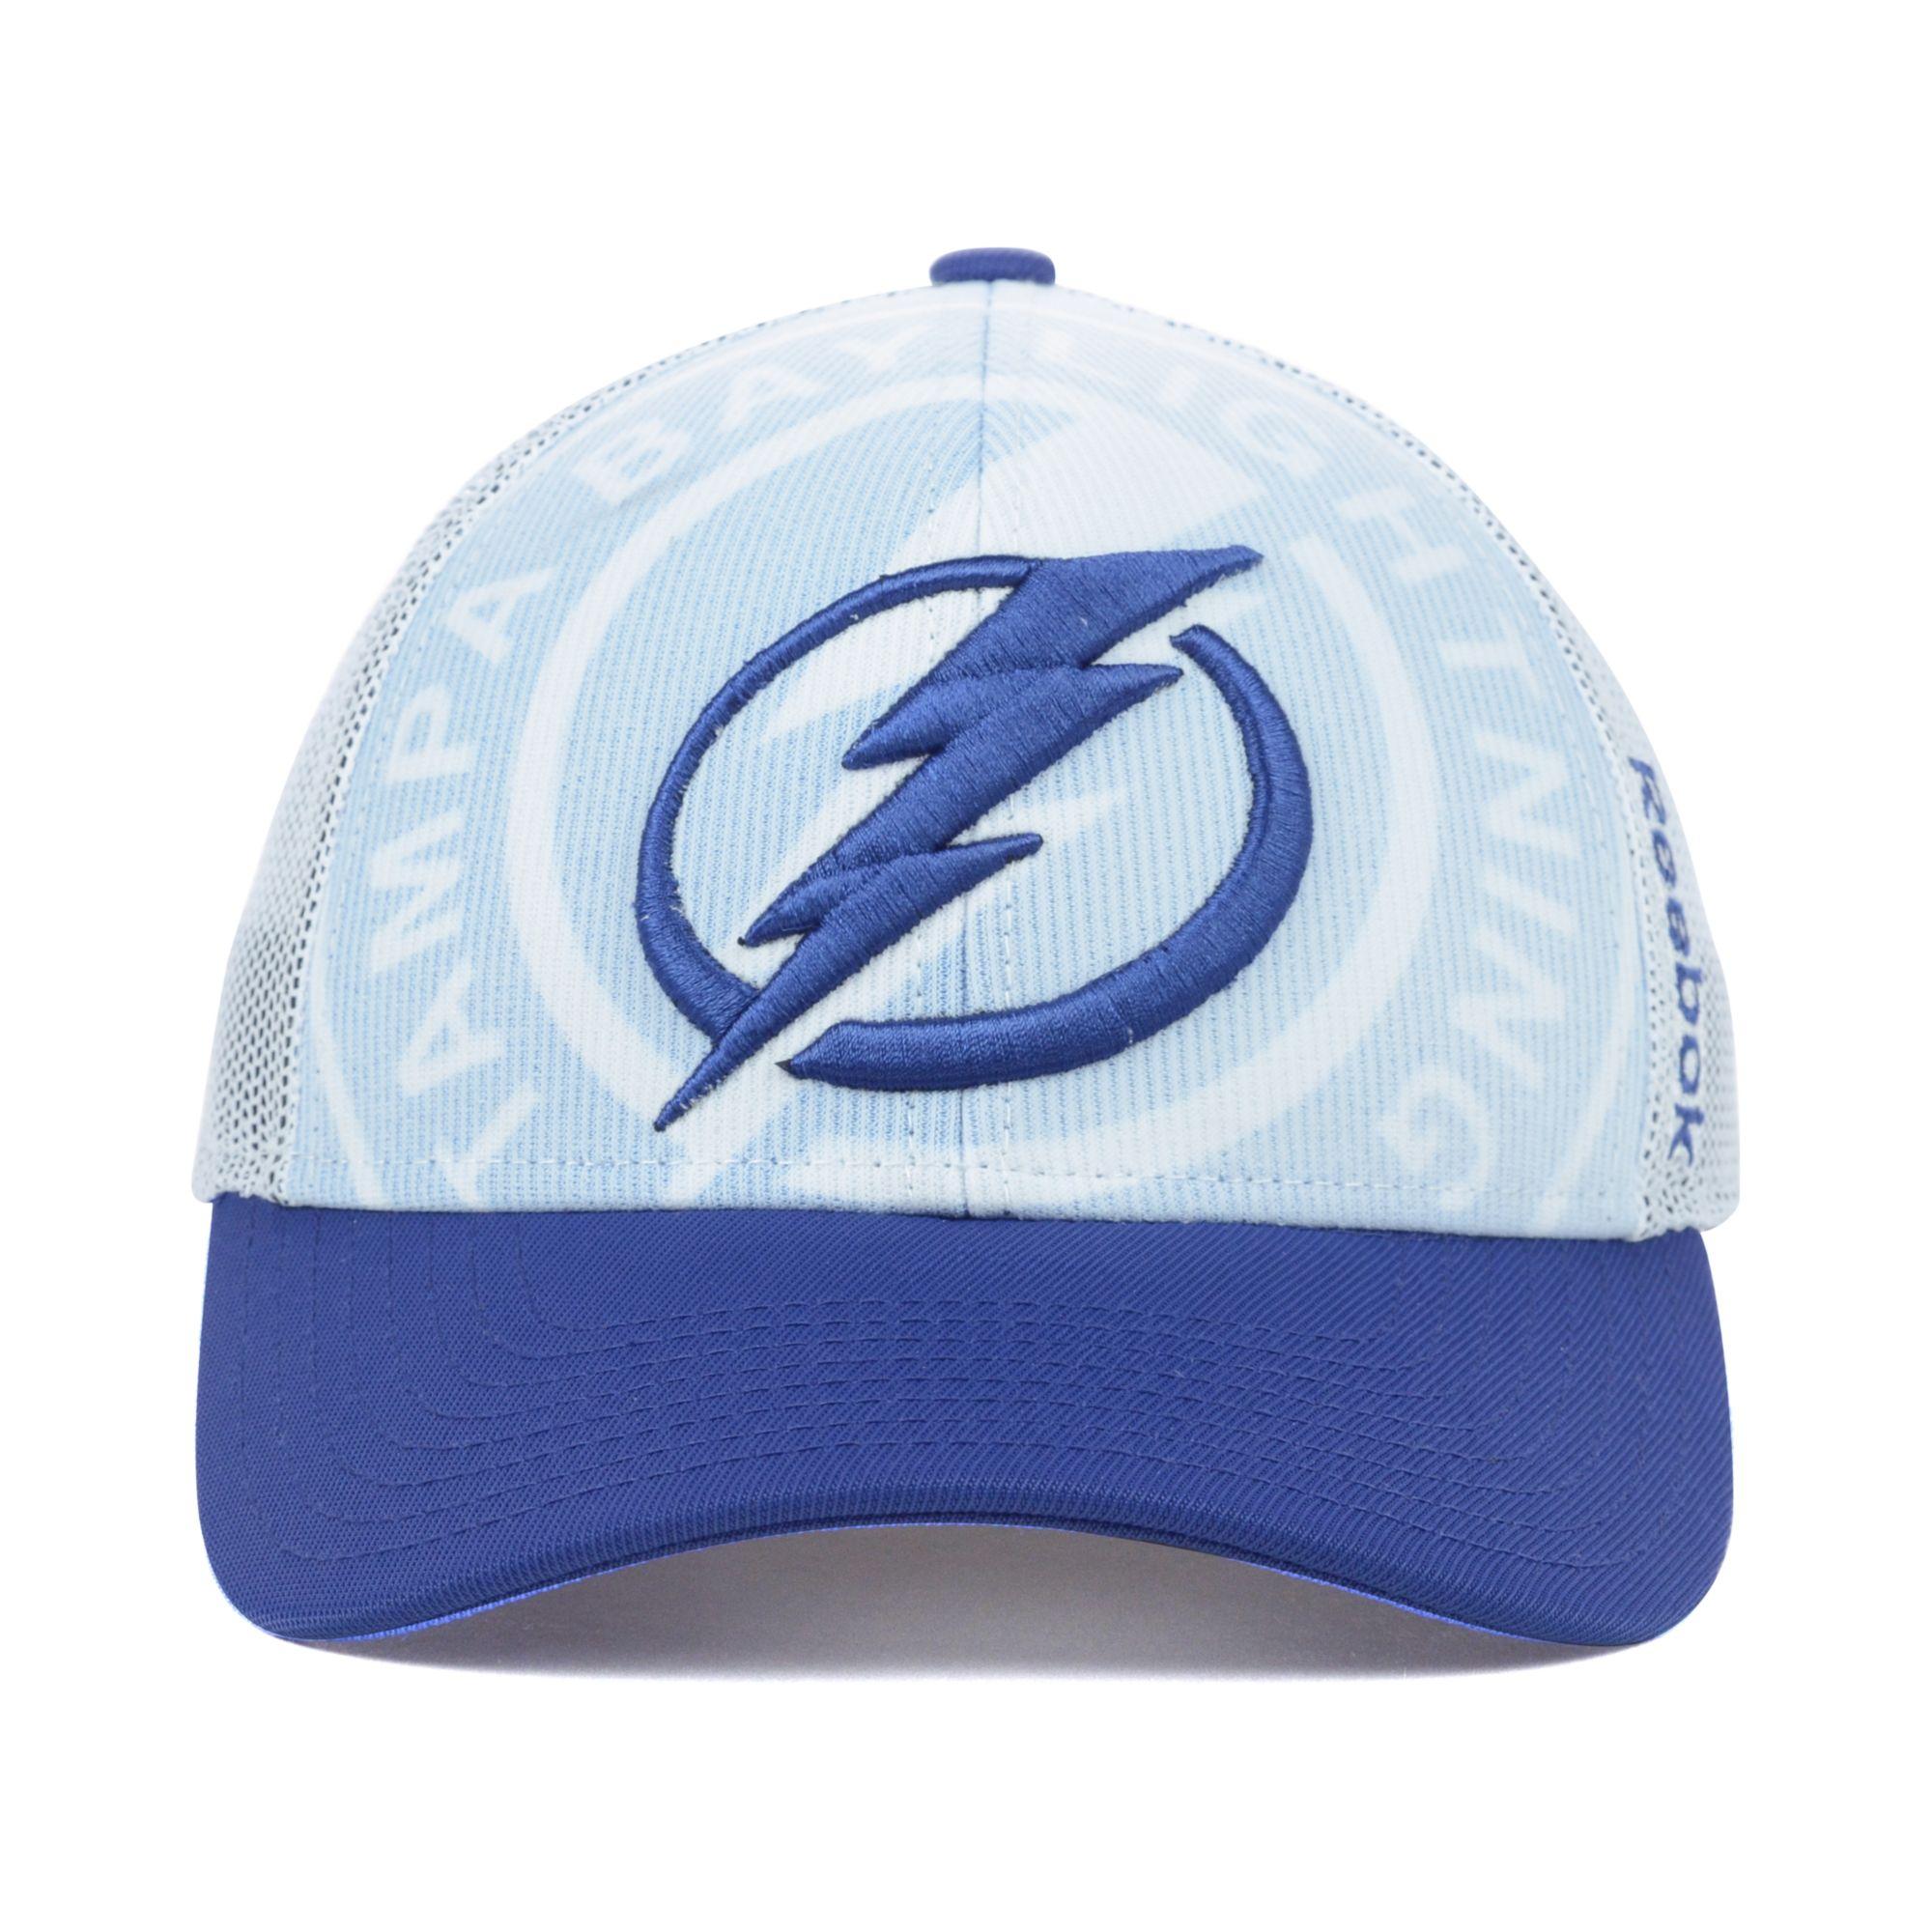 best service 5b0d9 24983 ... where to buy lyst reebok tampa bay lightning nhl draft cap in blue for  men 94c10